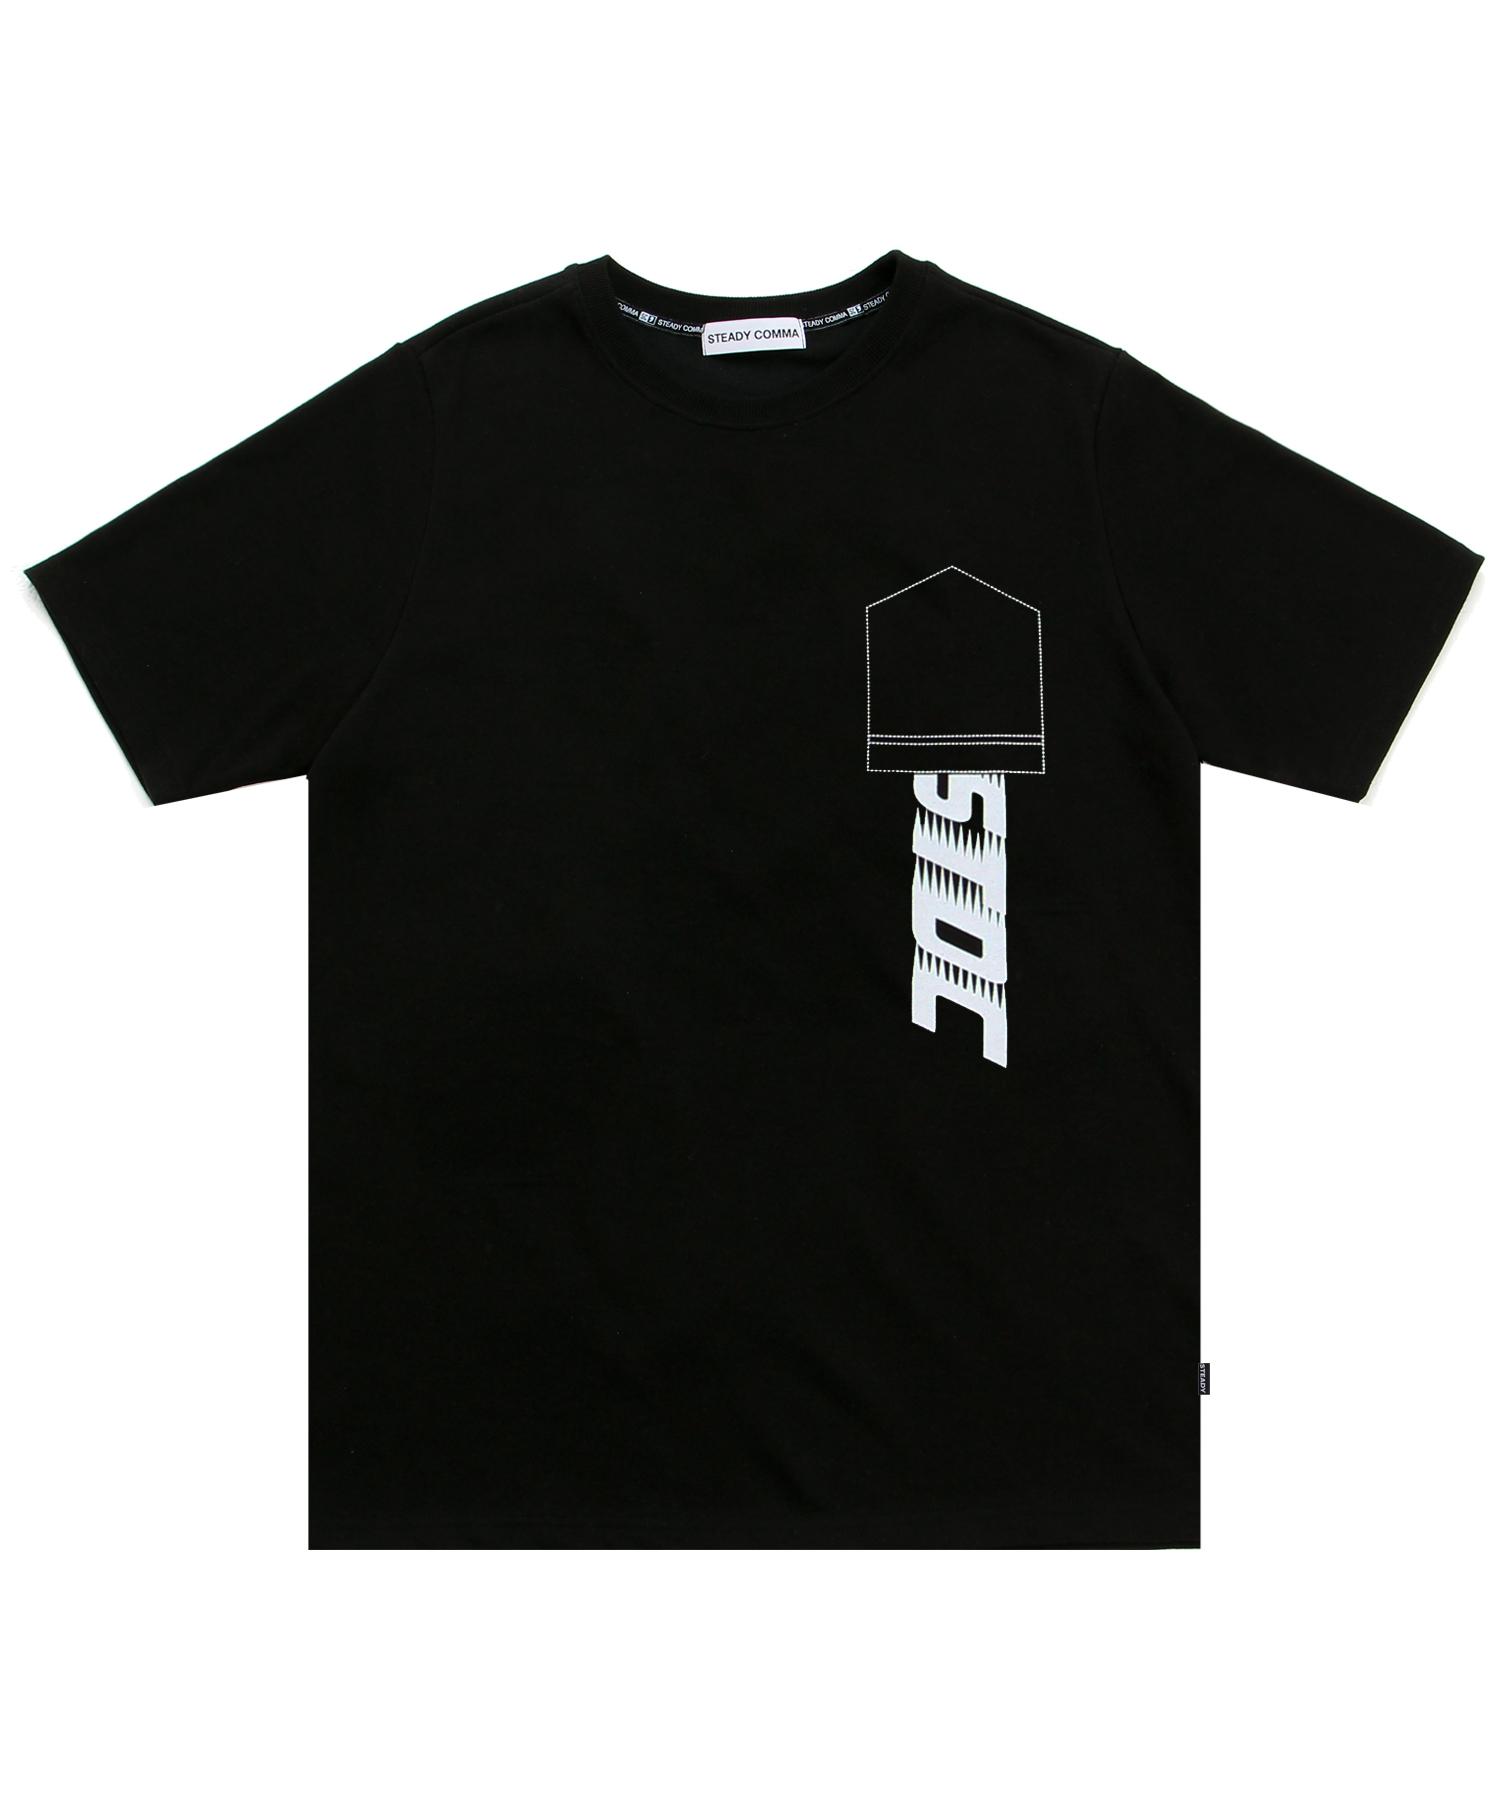 REVERSE POCKET LOGO T-SHIRT BLACK